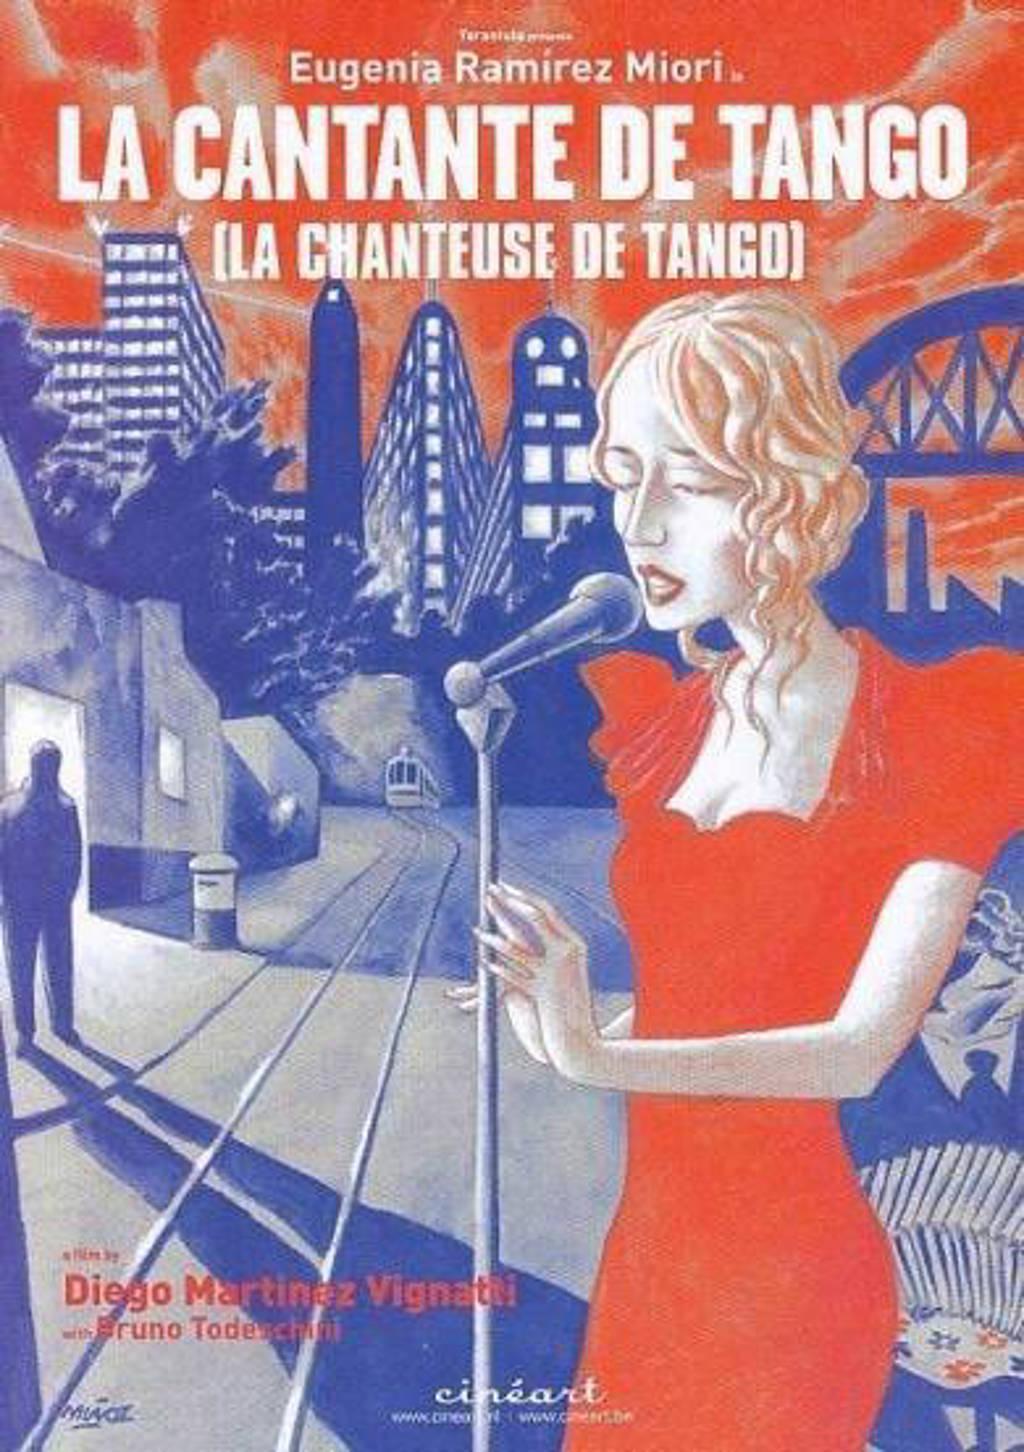 La cantante de tango (DVD)